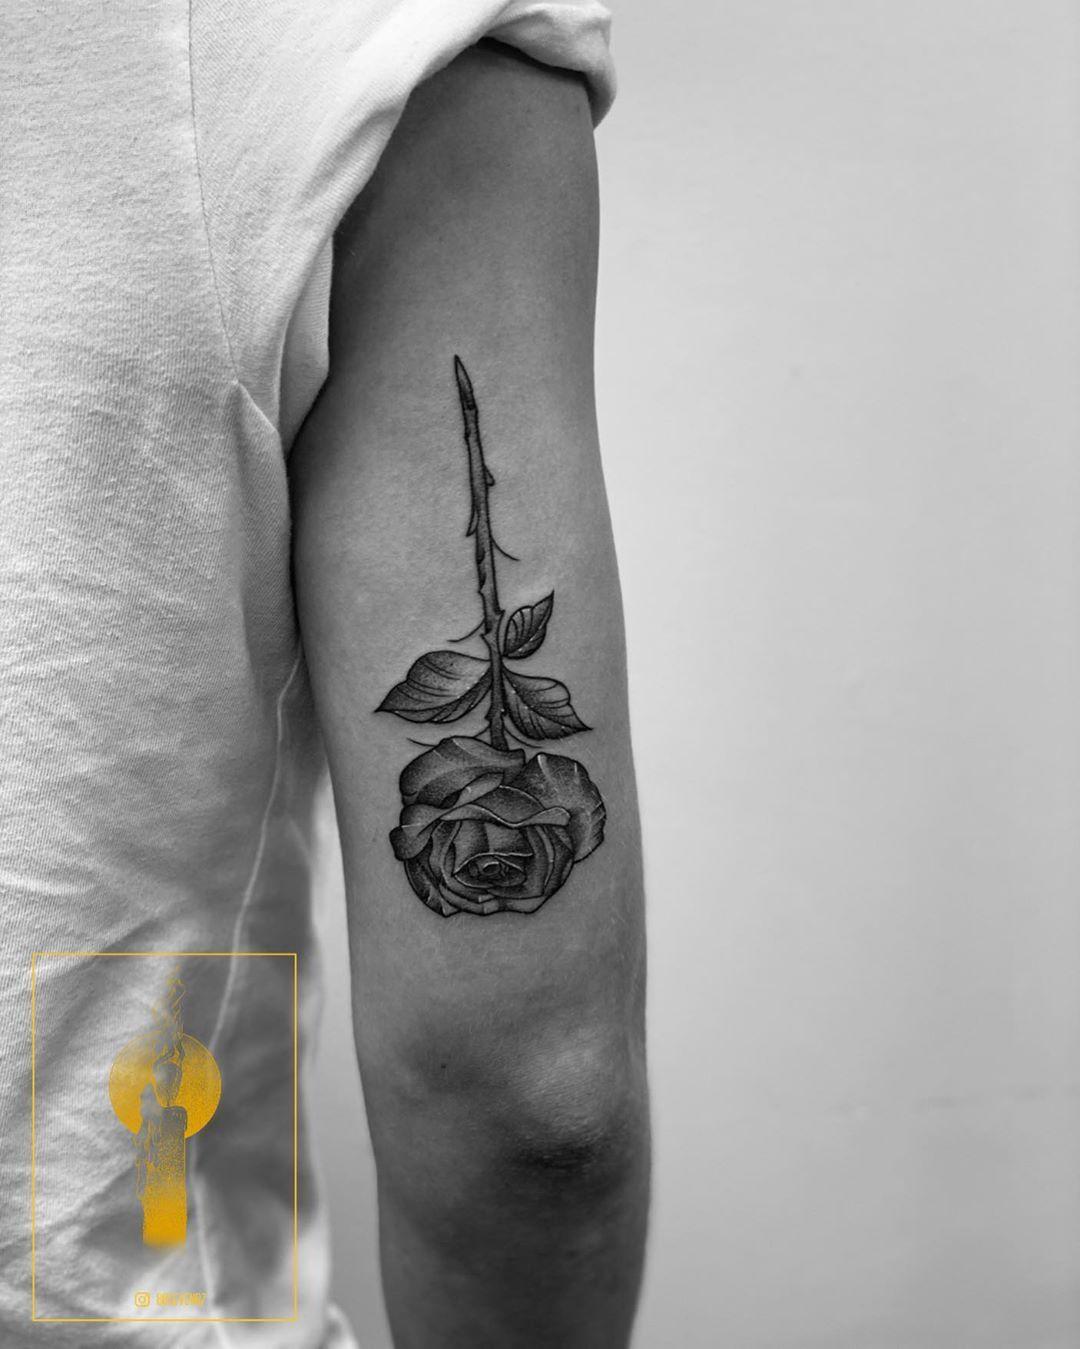 🌹 • • • •  #blxckink #btattooing #blacktattooart #blacktattooing #blackworkers #blackworkerssubmission #darkartist #dotwork #iblackwork #instinctsubmission #tattoo #idesign #art #artwork #tattooing #drawing #lines #linework #inkjunkeyz #inkedgirls #geometric #onlyblackart #engraving #equilaterra #fineline #floral #flowertattoo